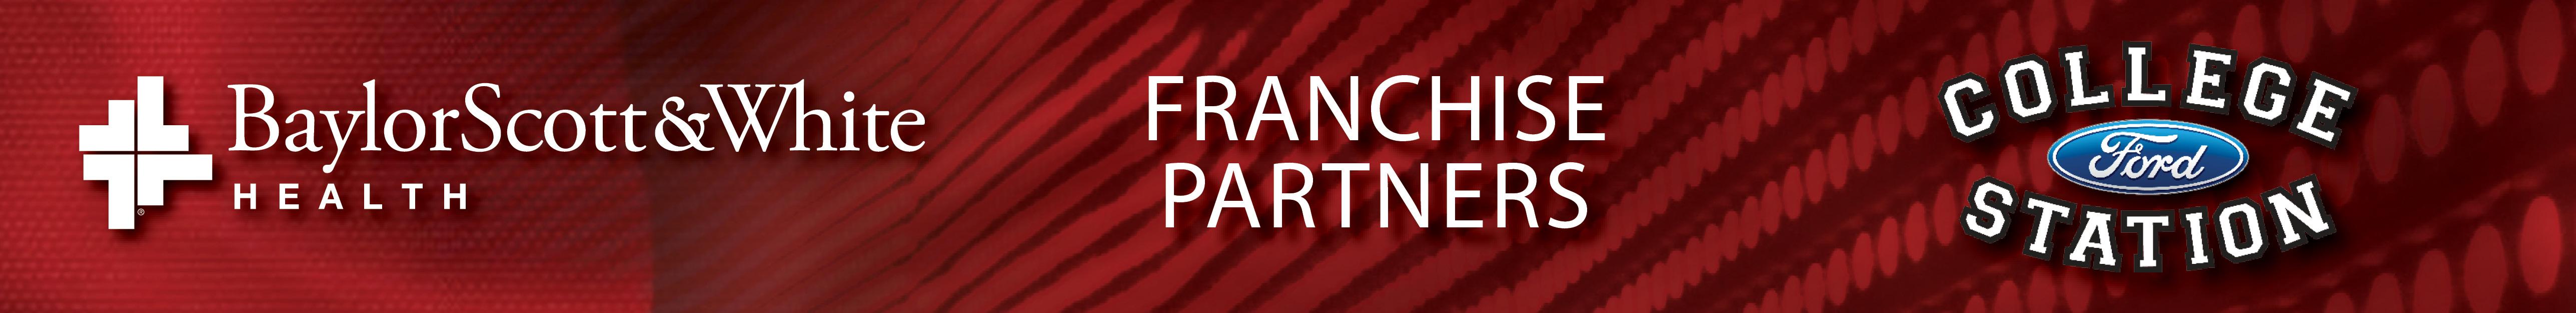 Franchise Partners